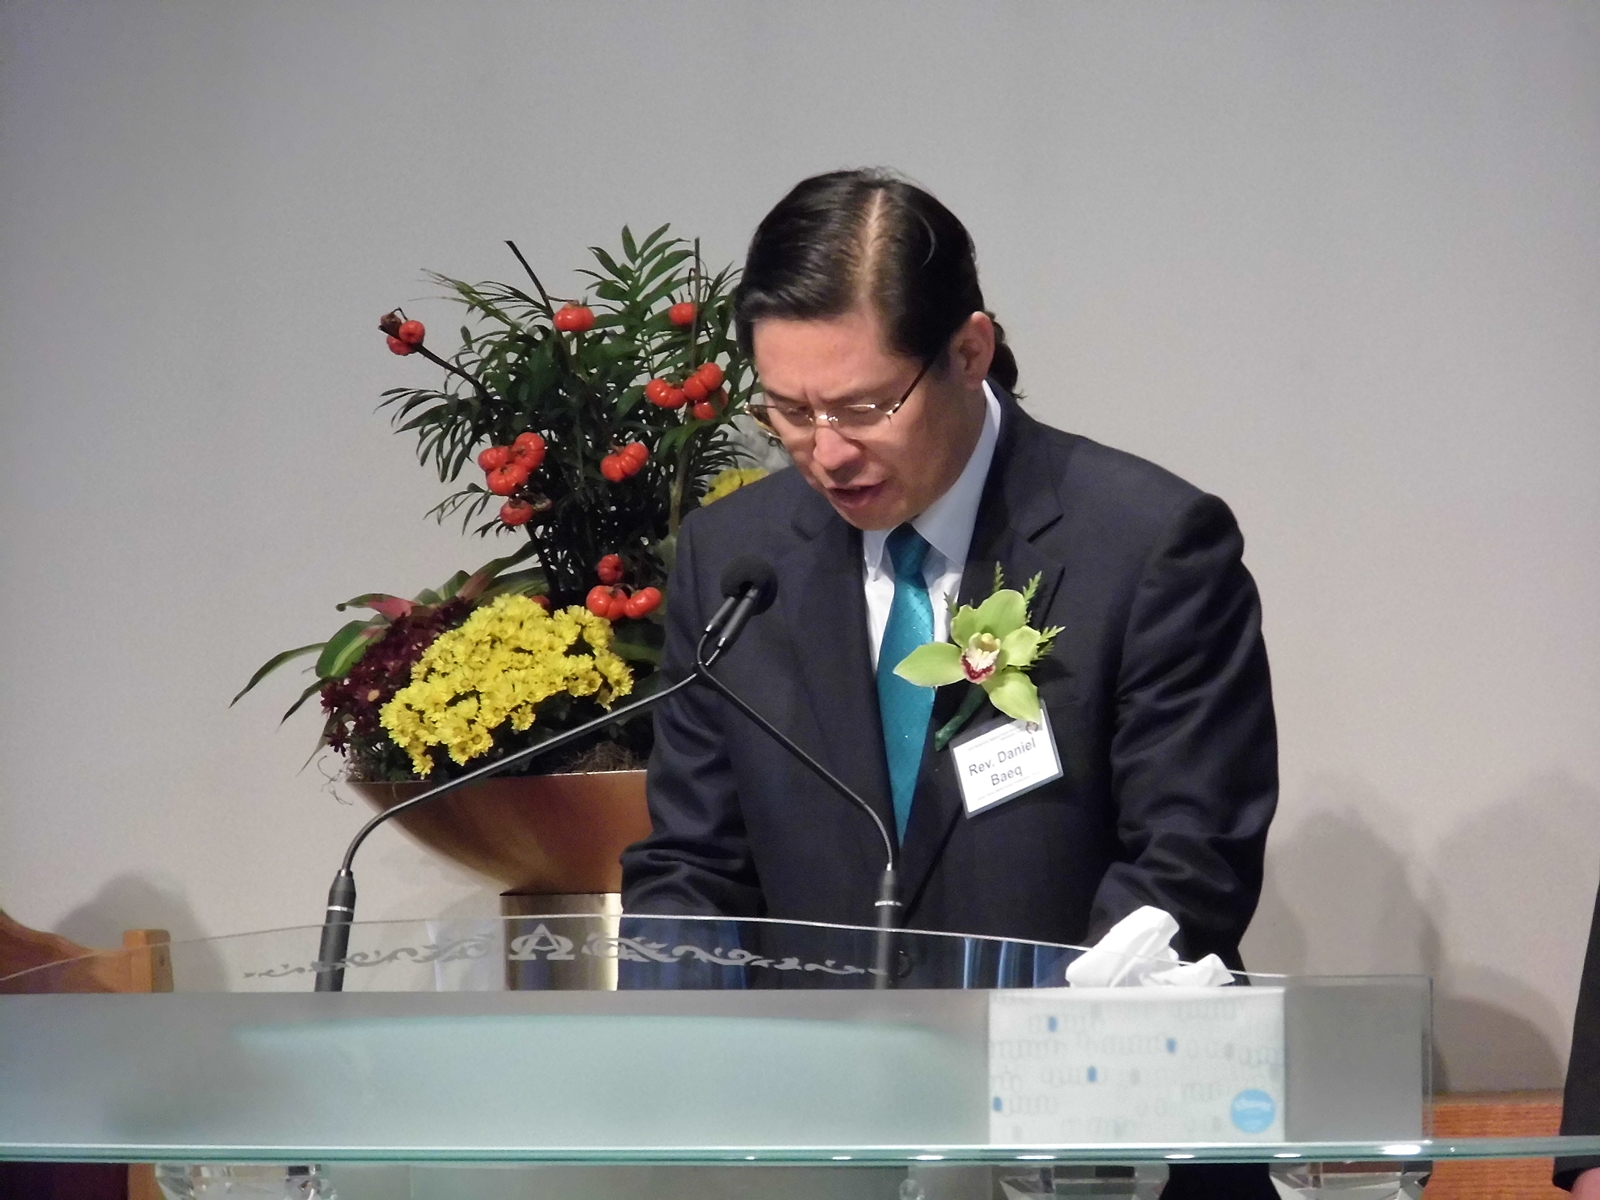 12th Annual Korea-US NPB